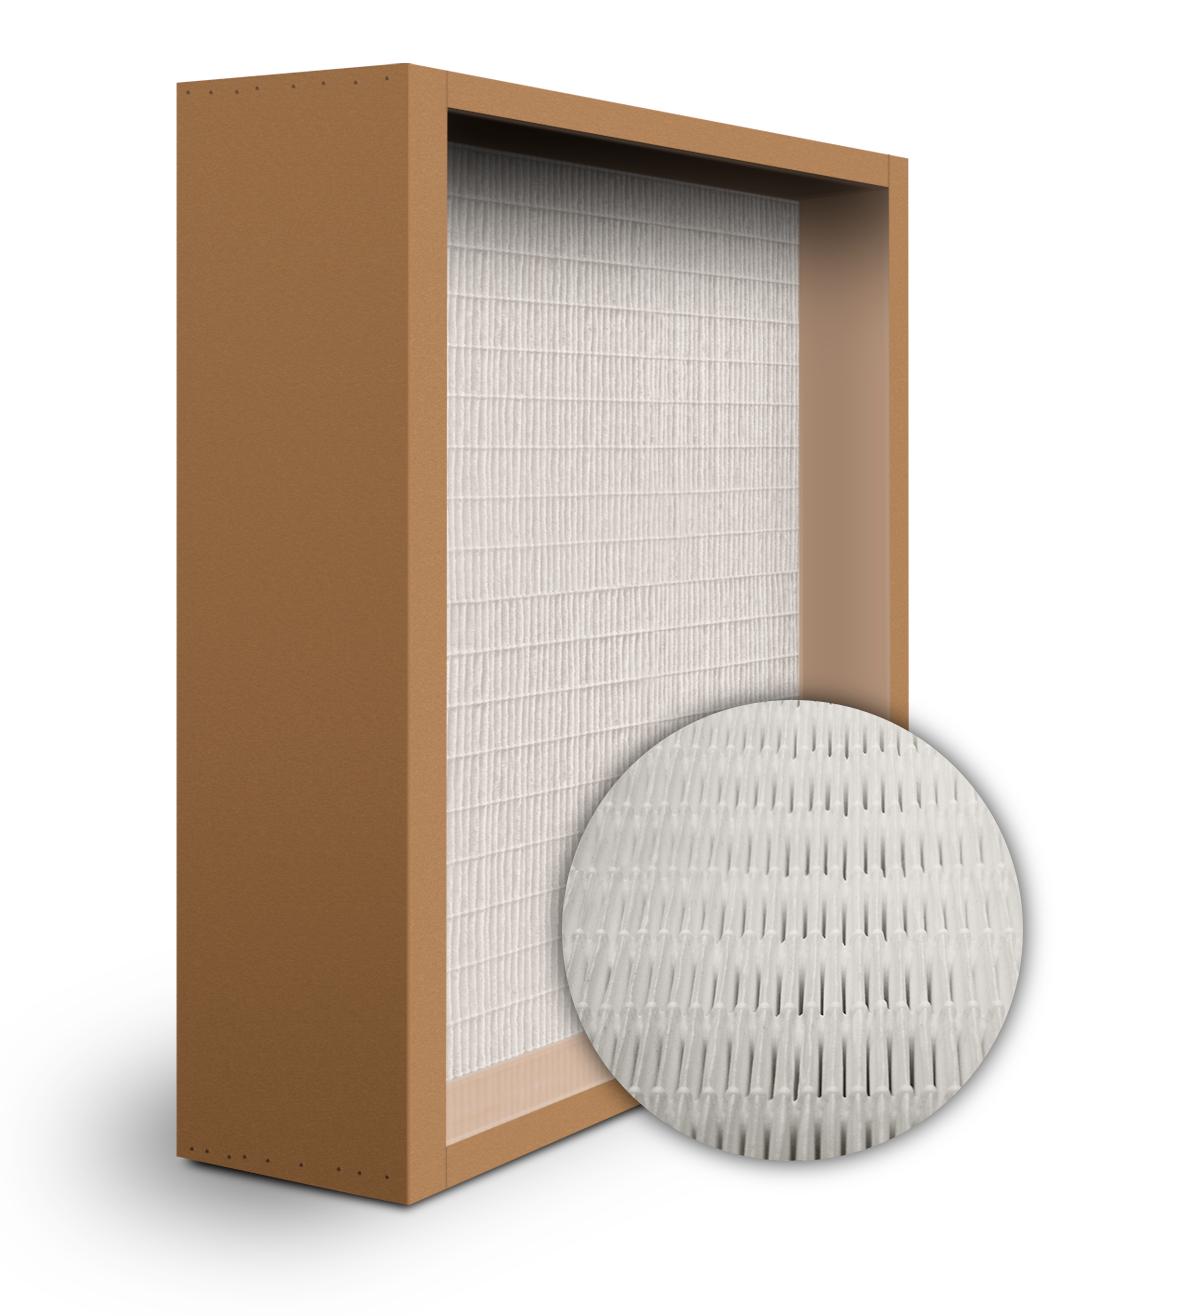 SuperFlo Max ASHRAE 65% (MERV 11/12) Particle Board Frame Mini Pleat Filter 20x25x6